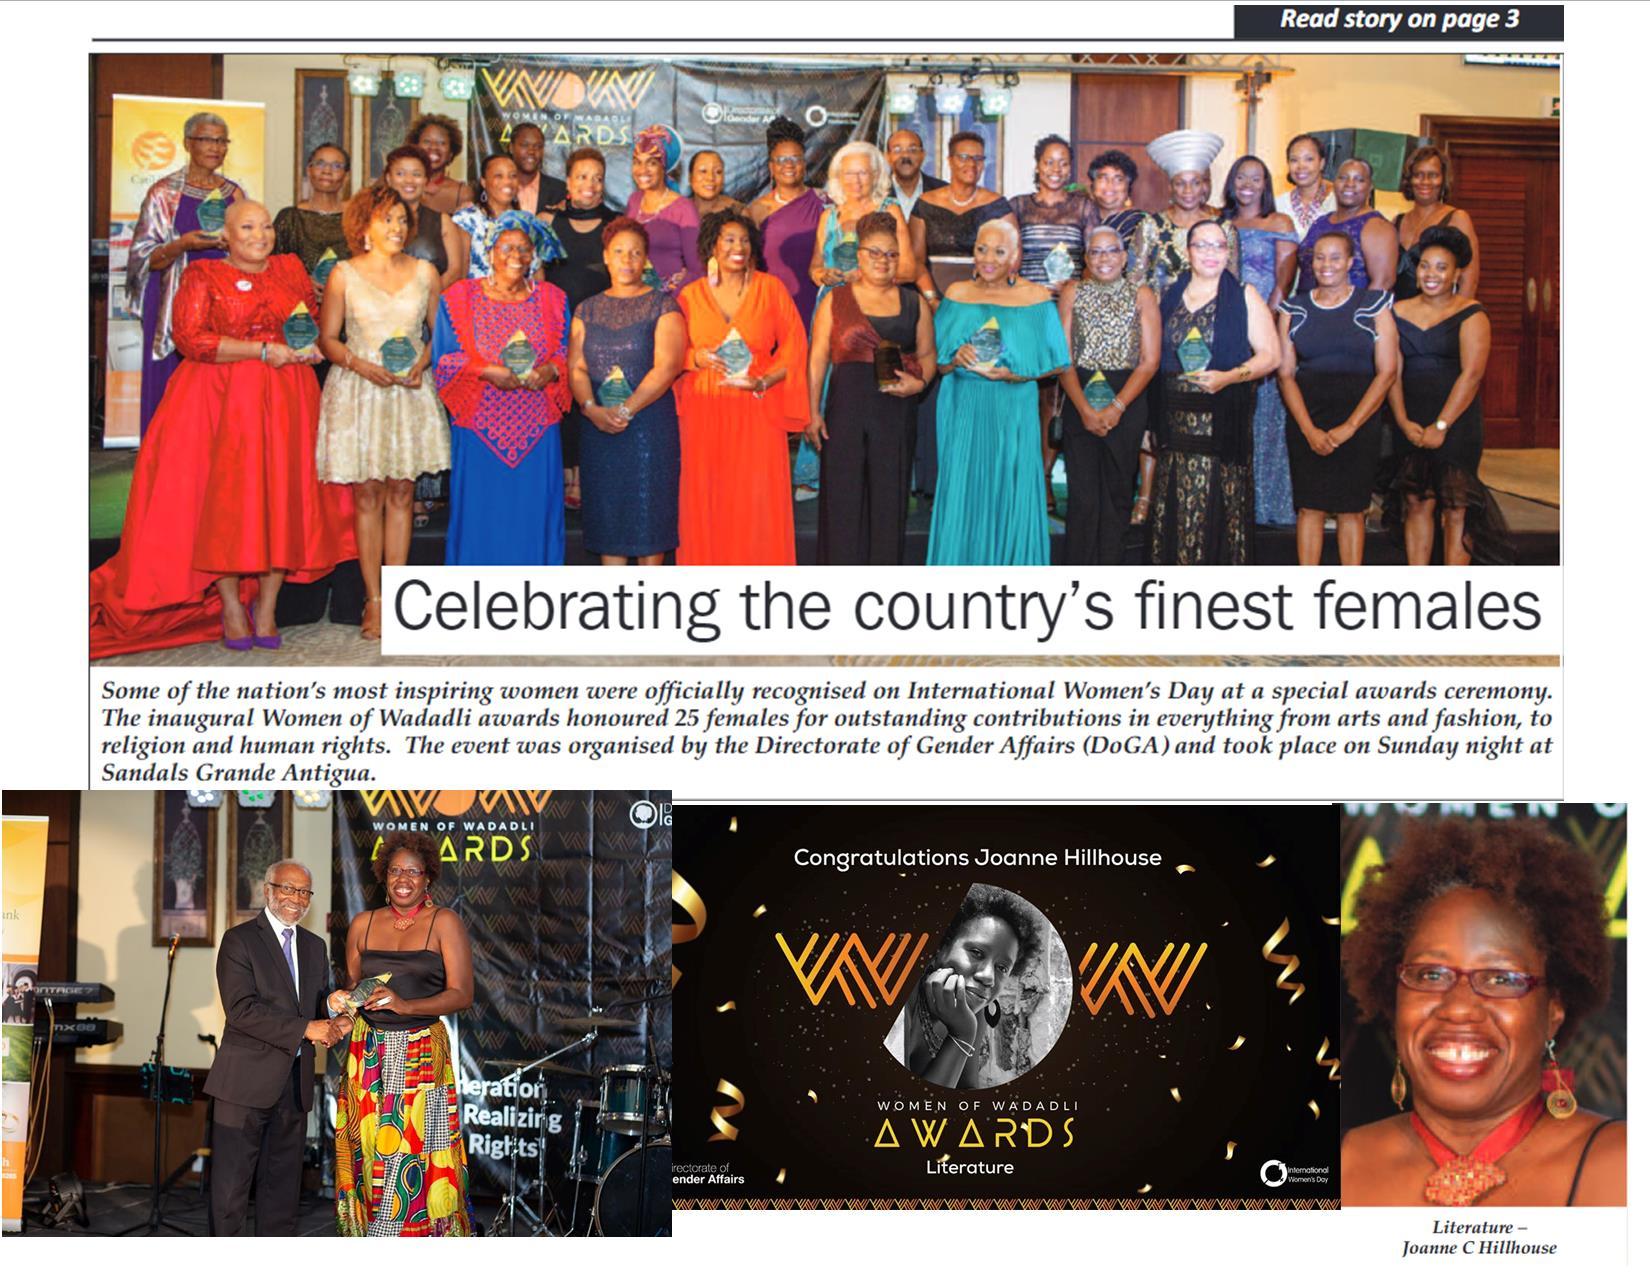 Women of Wadadli Awards March 2020